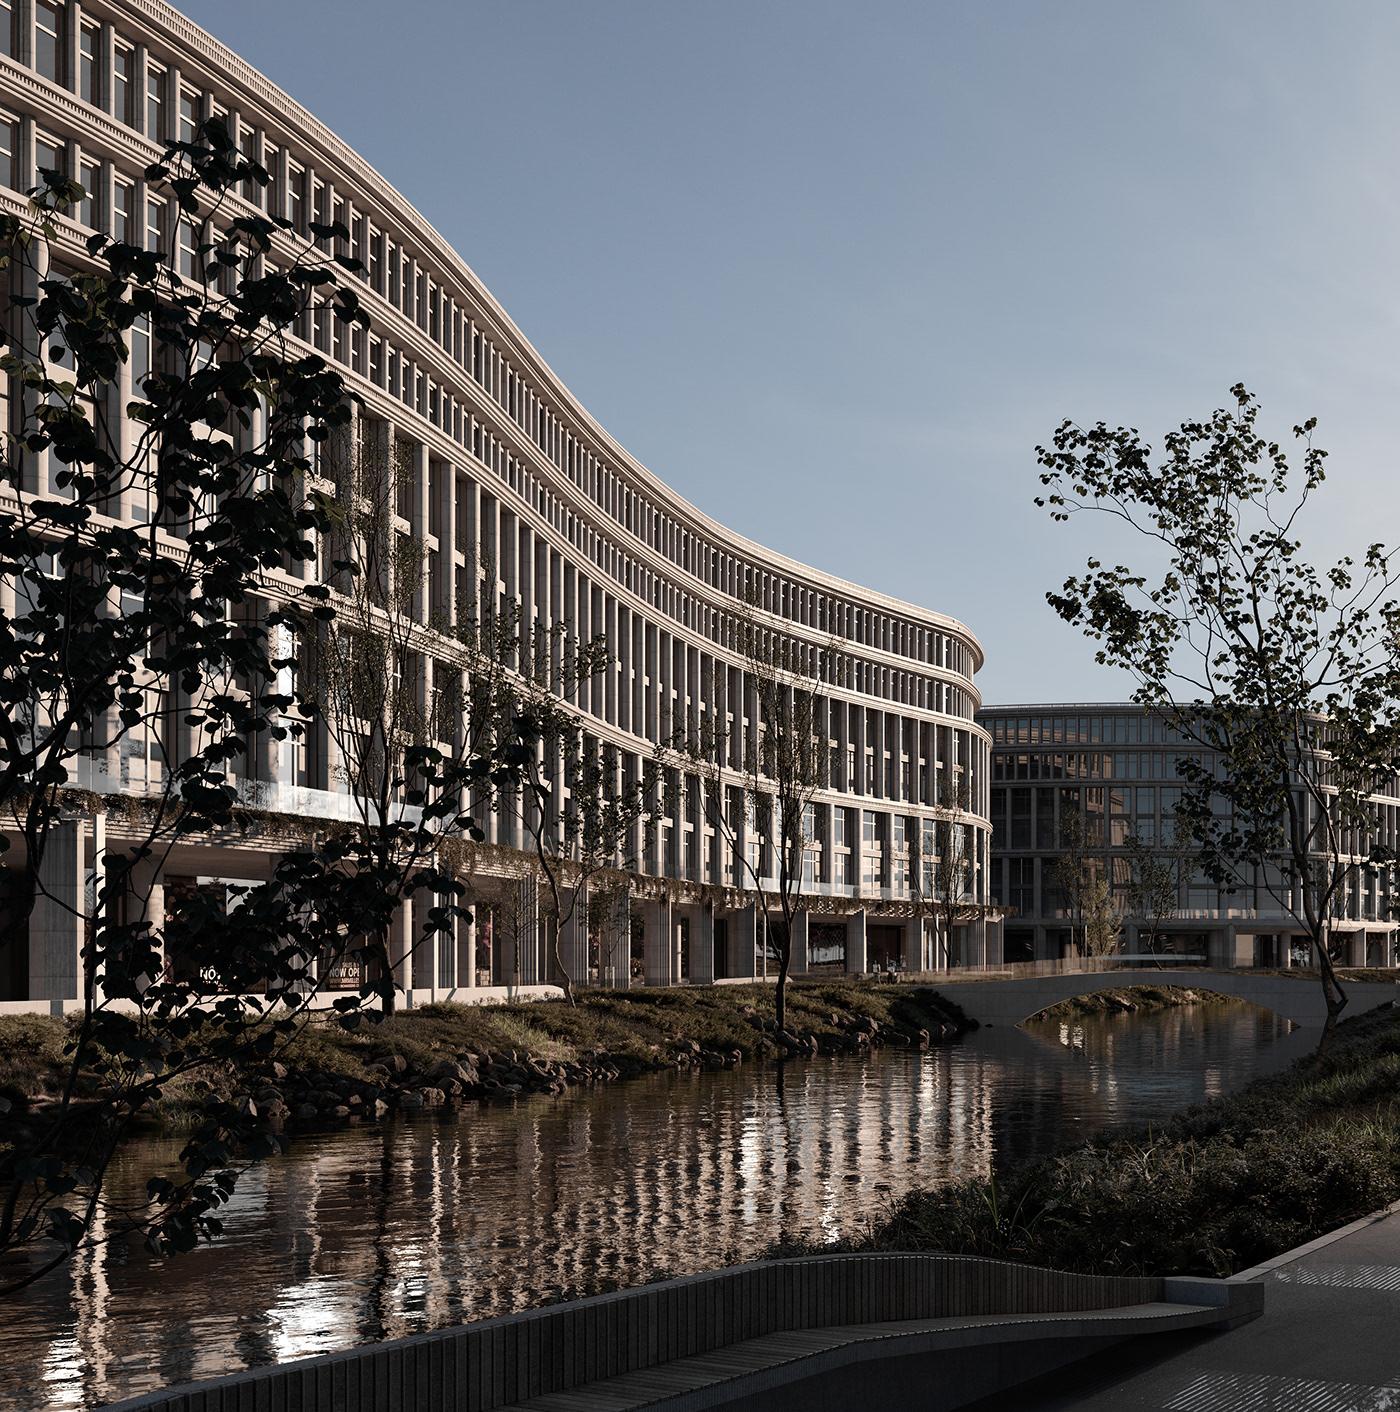 3dsmax appartmentbuilding architecture archviz concept coronarenderer Render visualisation